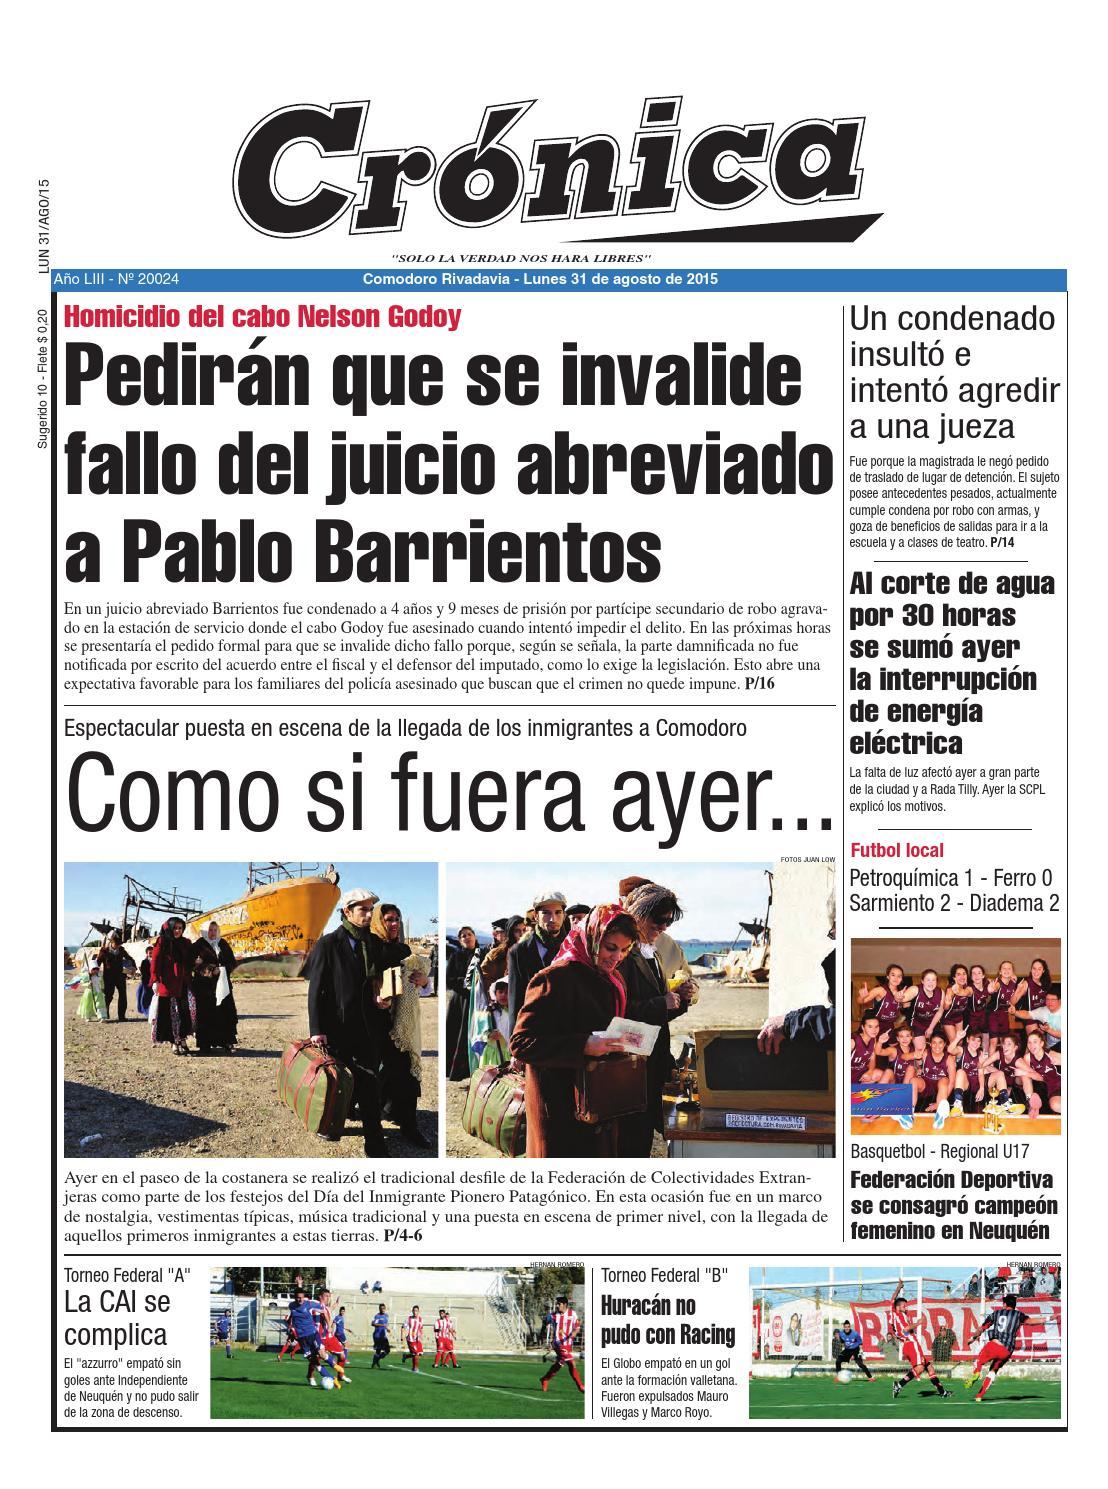 6083c658197acb406e02c6e8633c1a95 by Diario Crónica - issuu 1e531c0610bd8